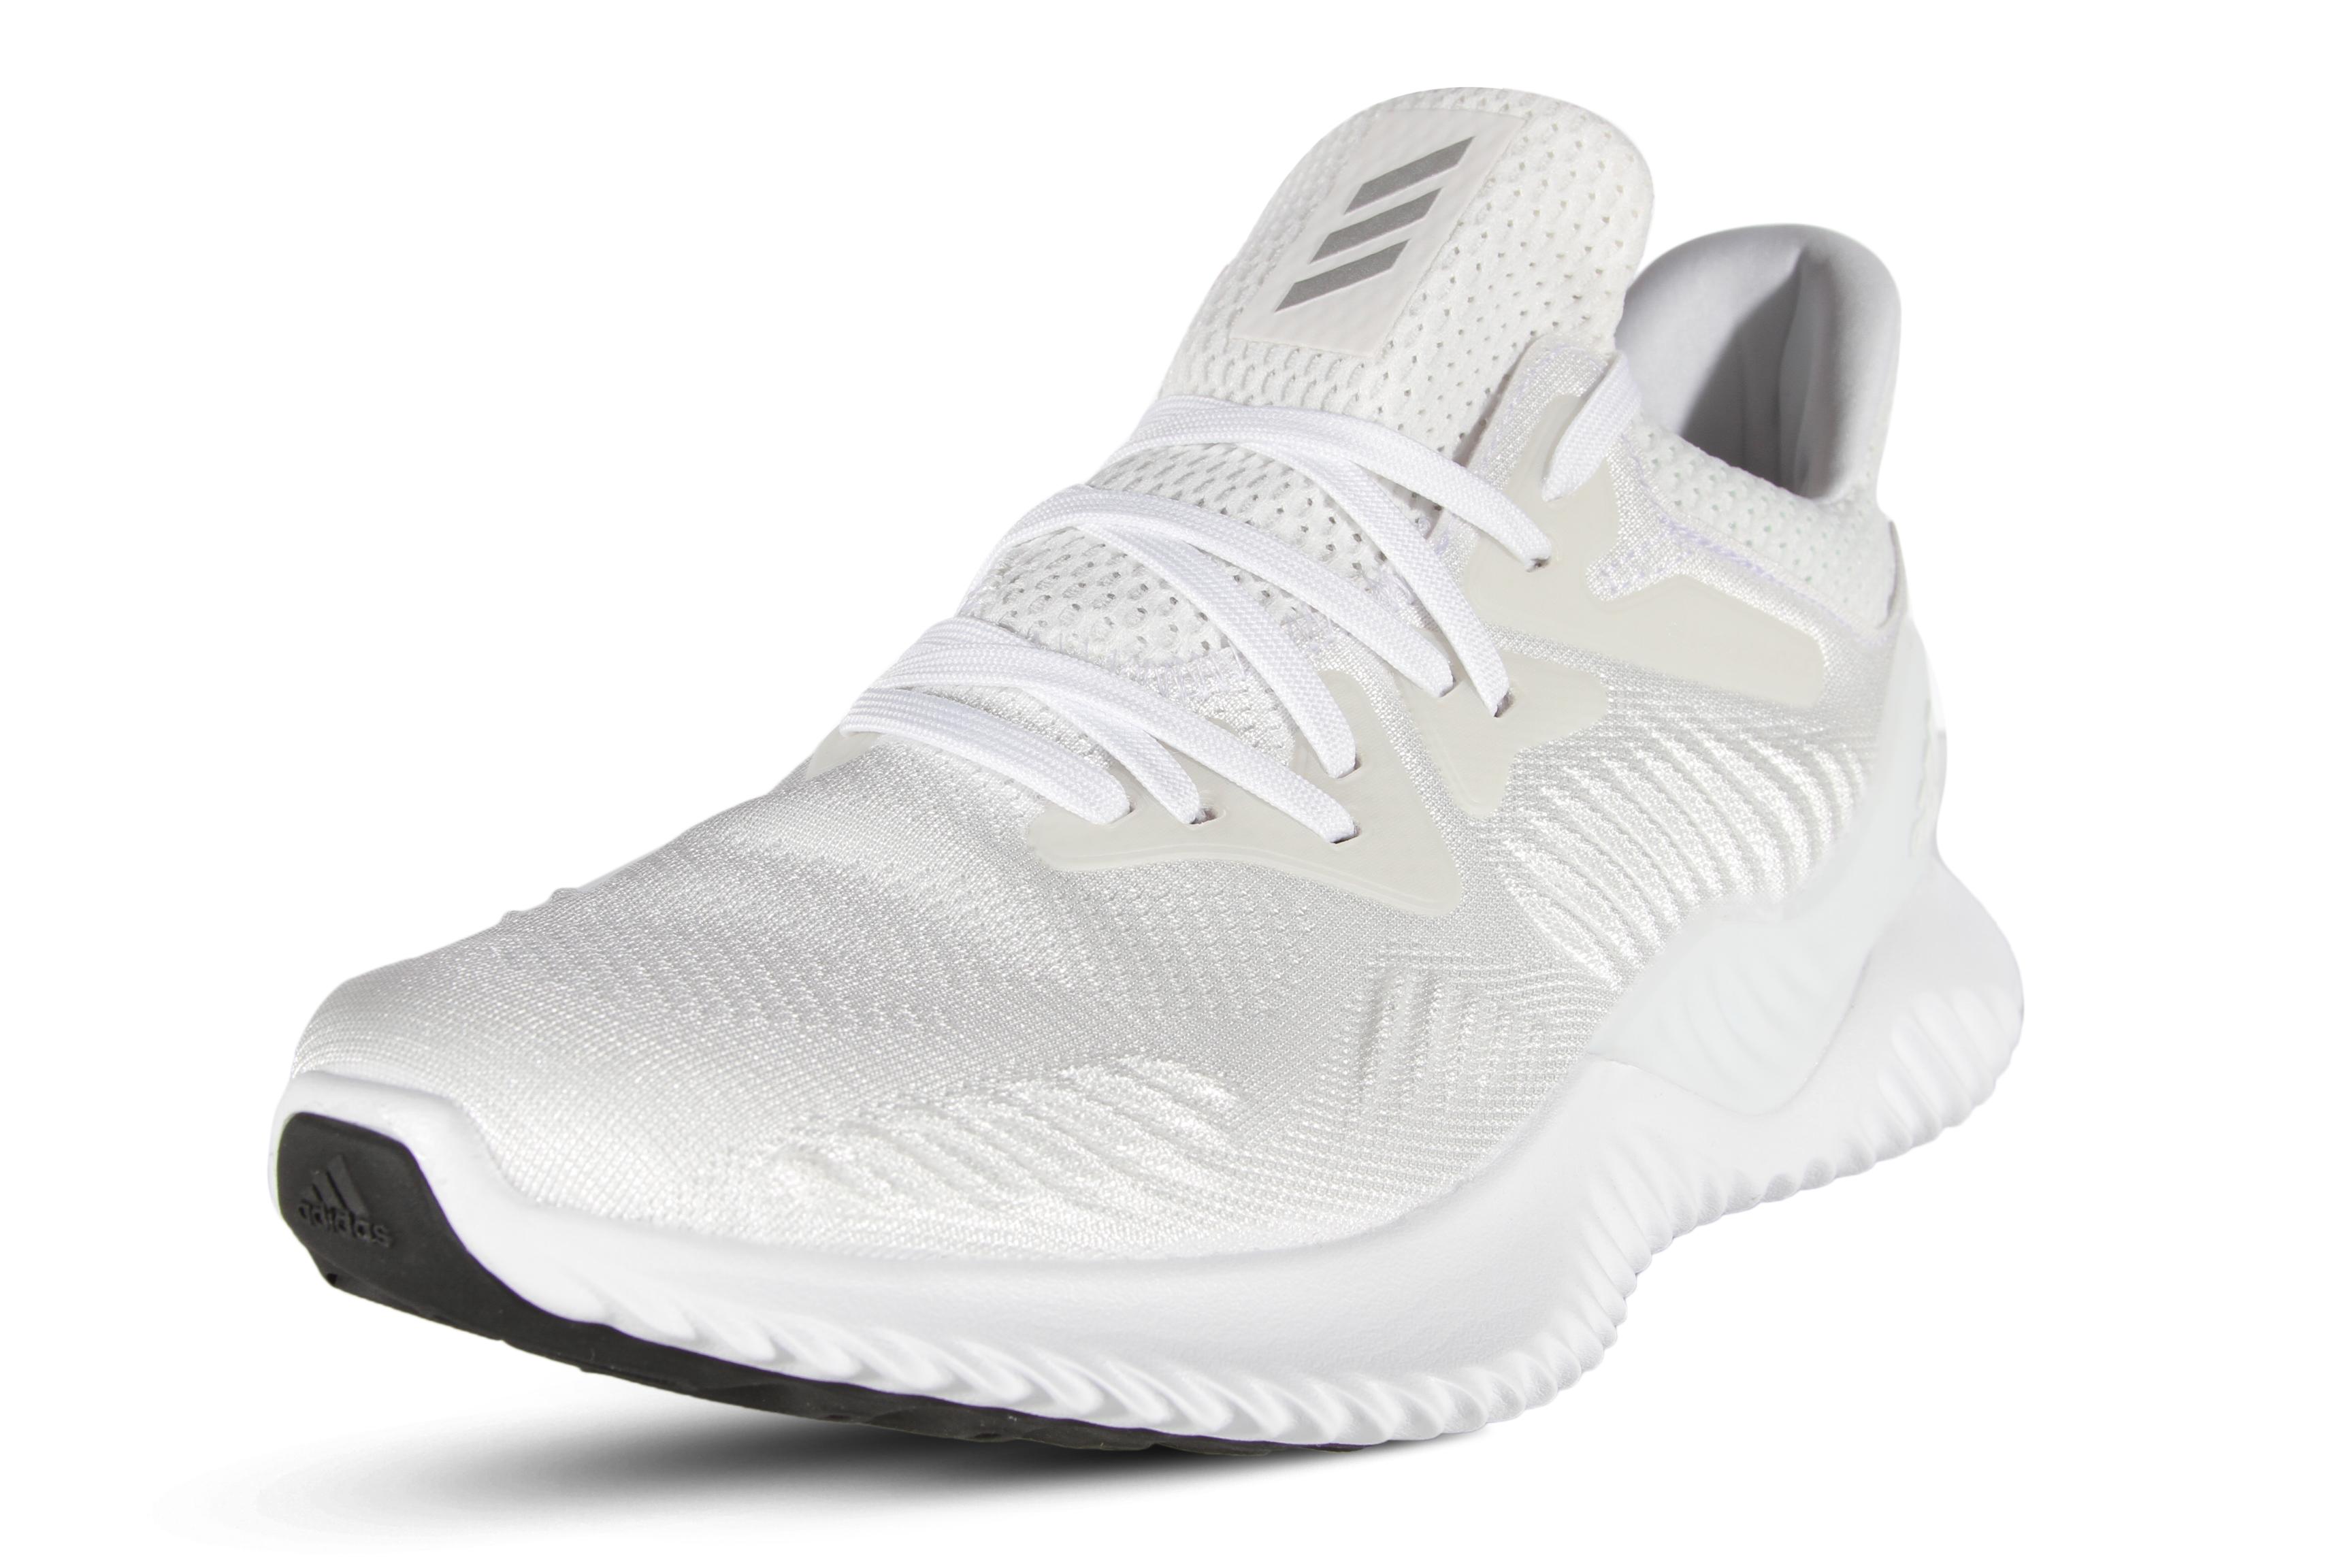 adidas alphabounce oltre le scarpe da corsa ac8634 10 ebay